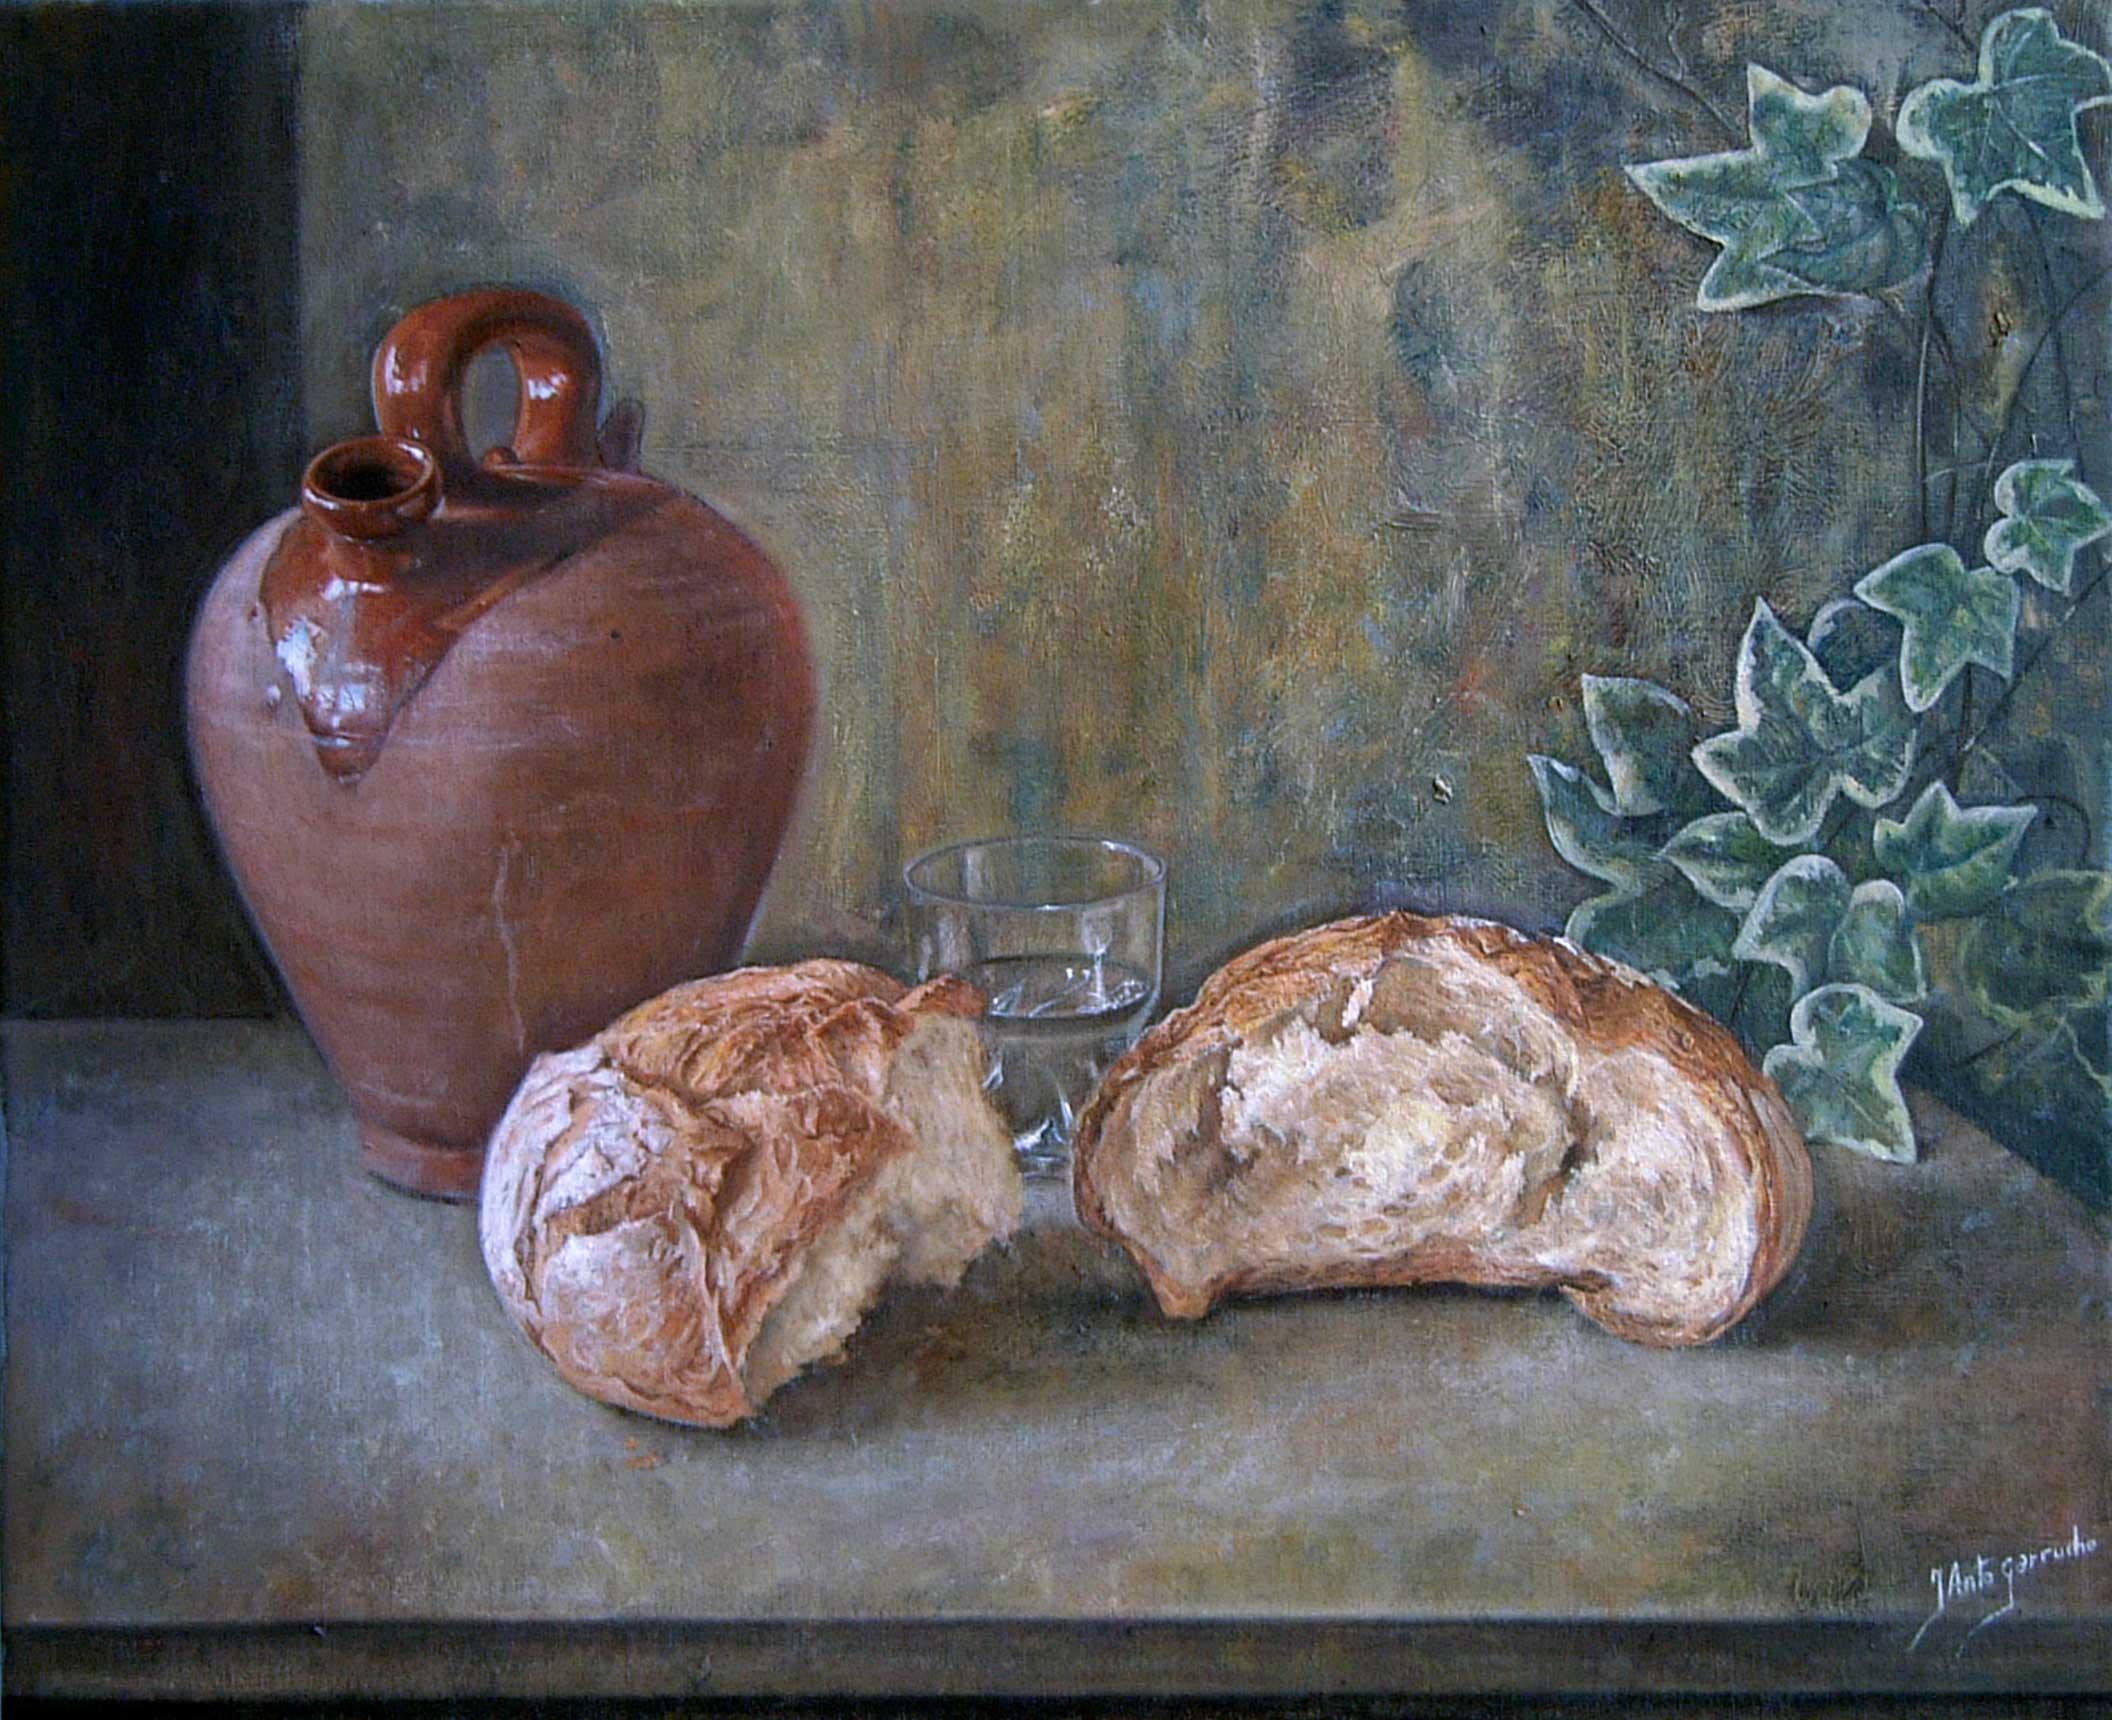 Botijo, pan y hiedra